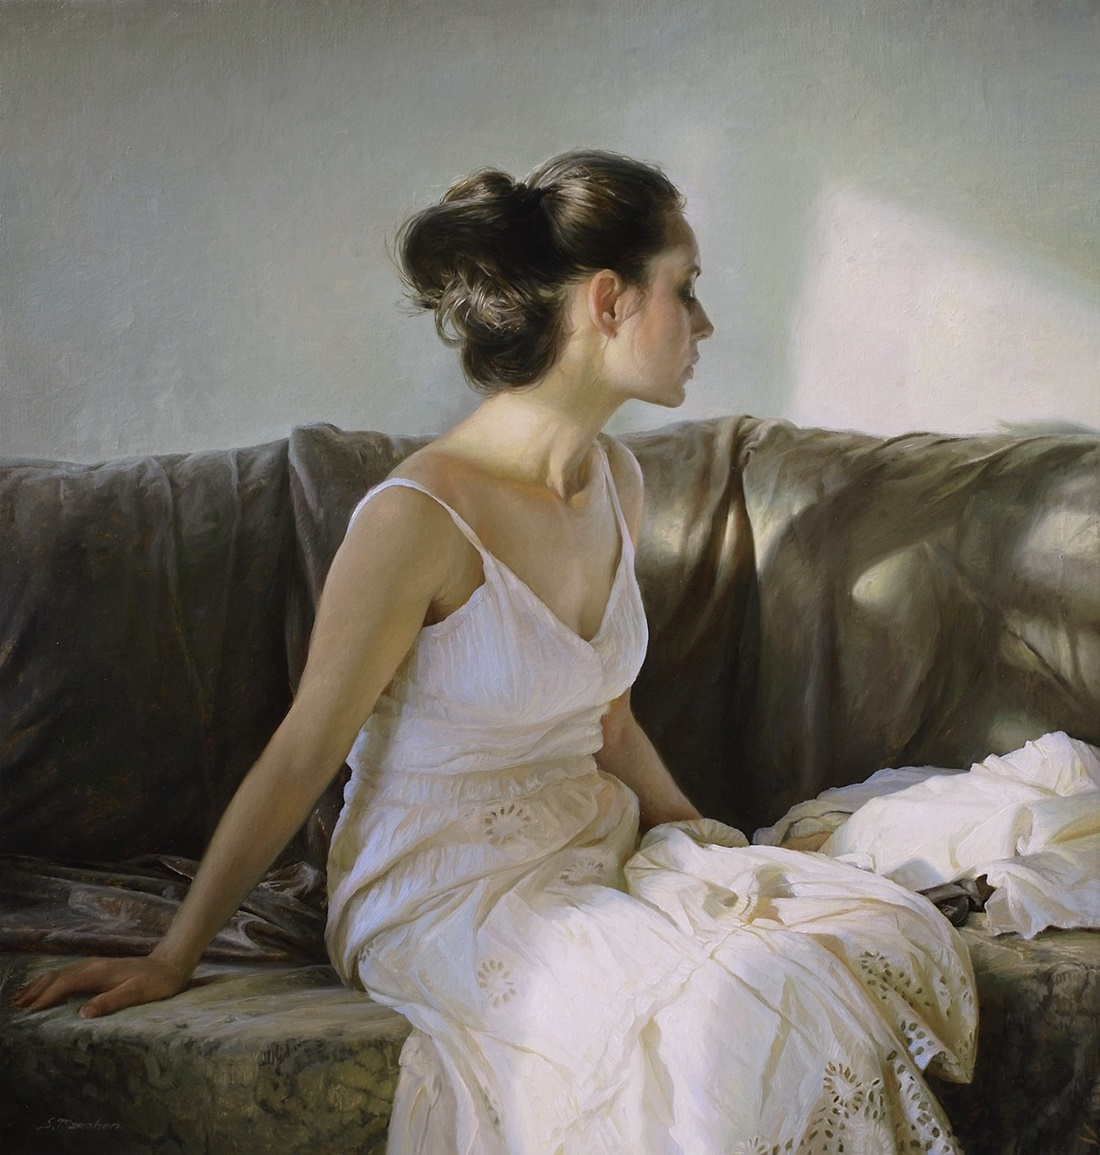 Women's images by a Russian realist artist Sergey Marshennikov - 30